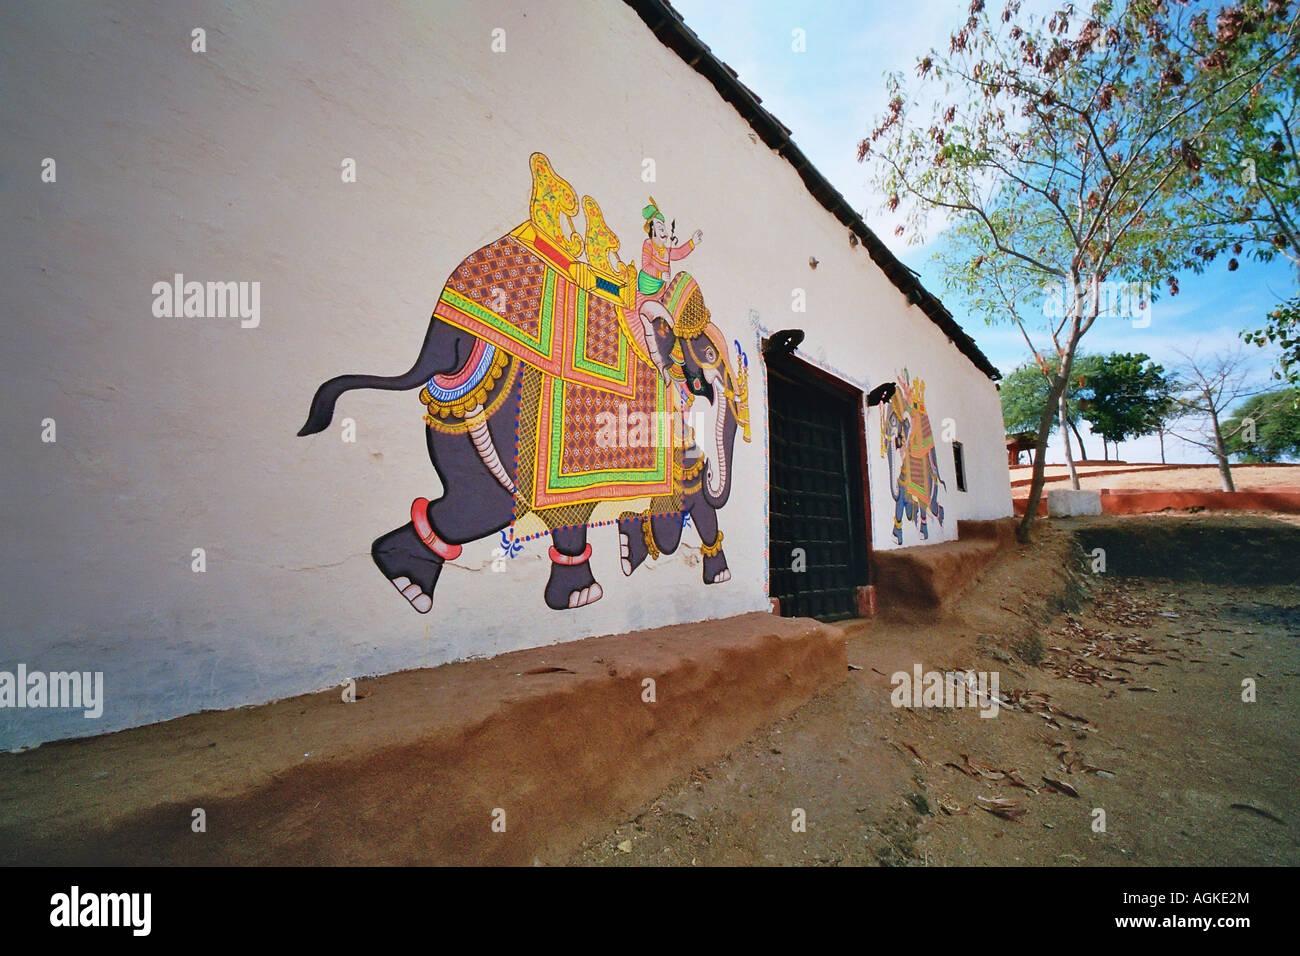 Painet Jm7783 Painted Painting Wall Elephant King Artist Art Door